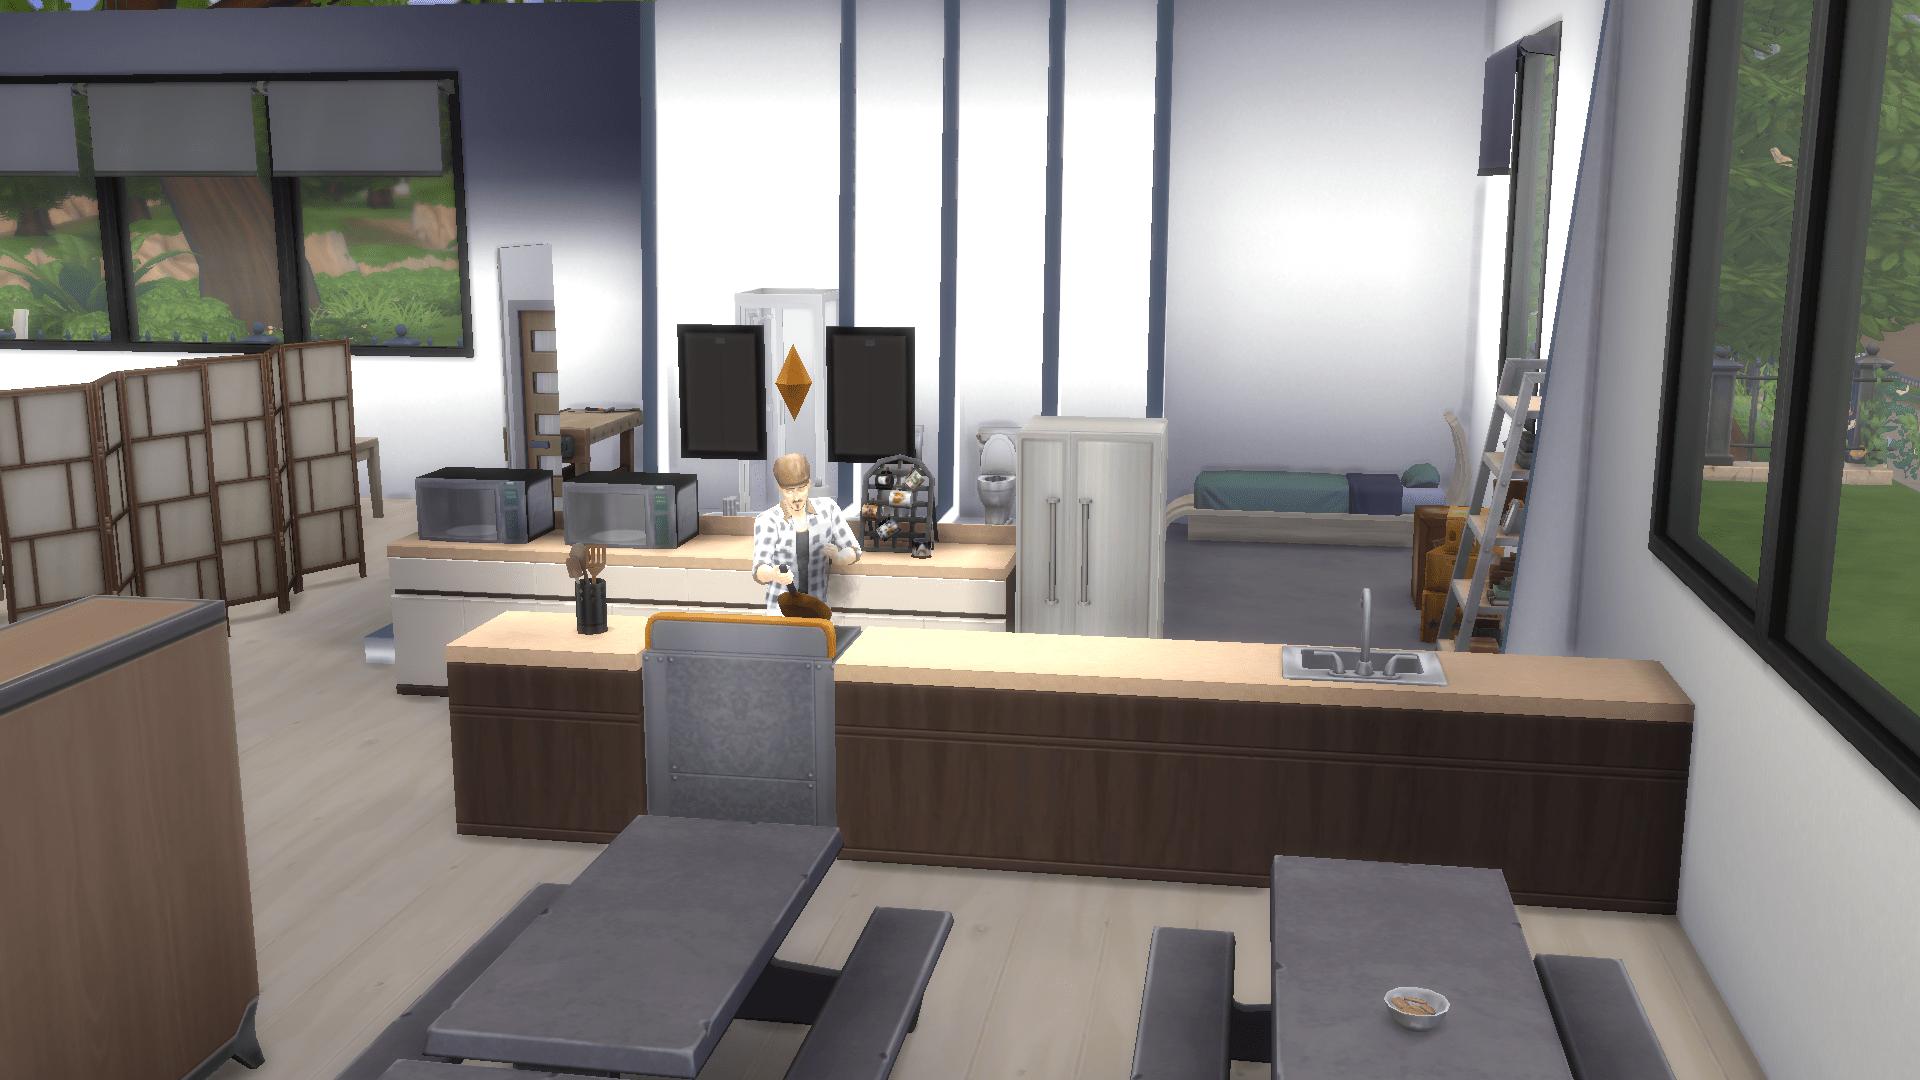 TSL office sims 4